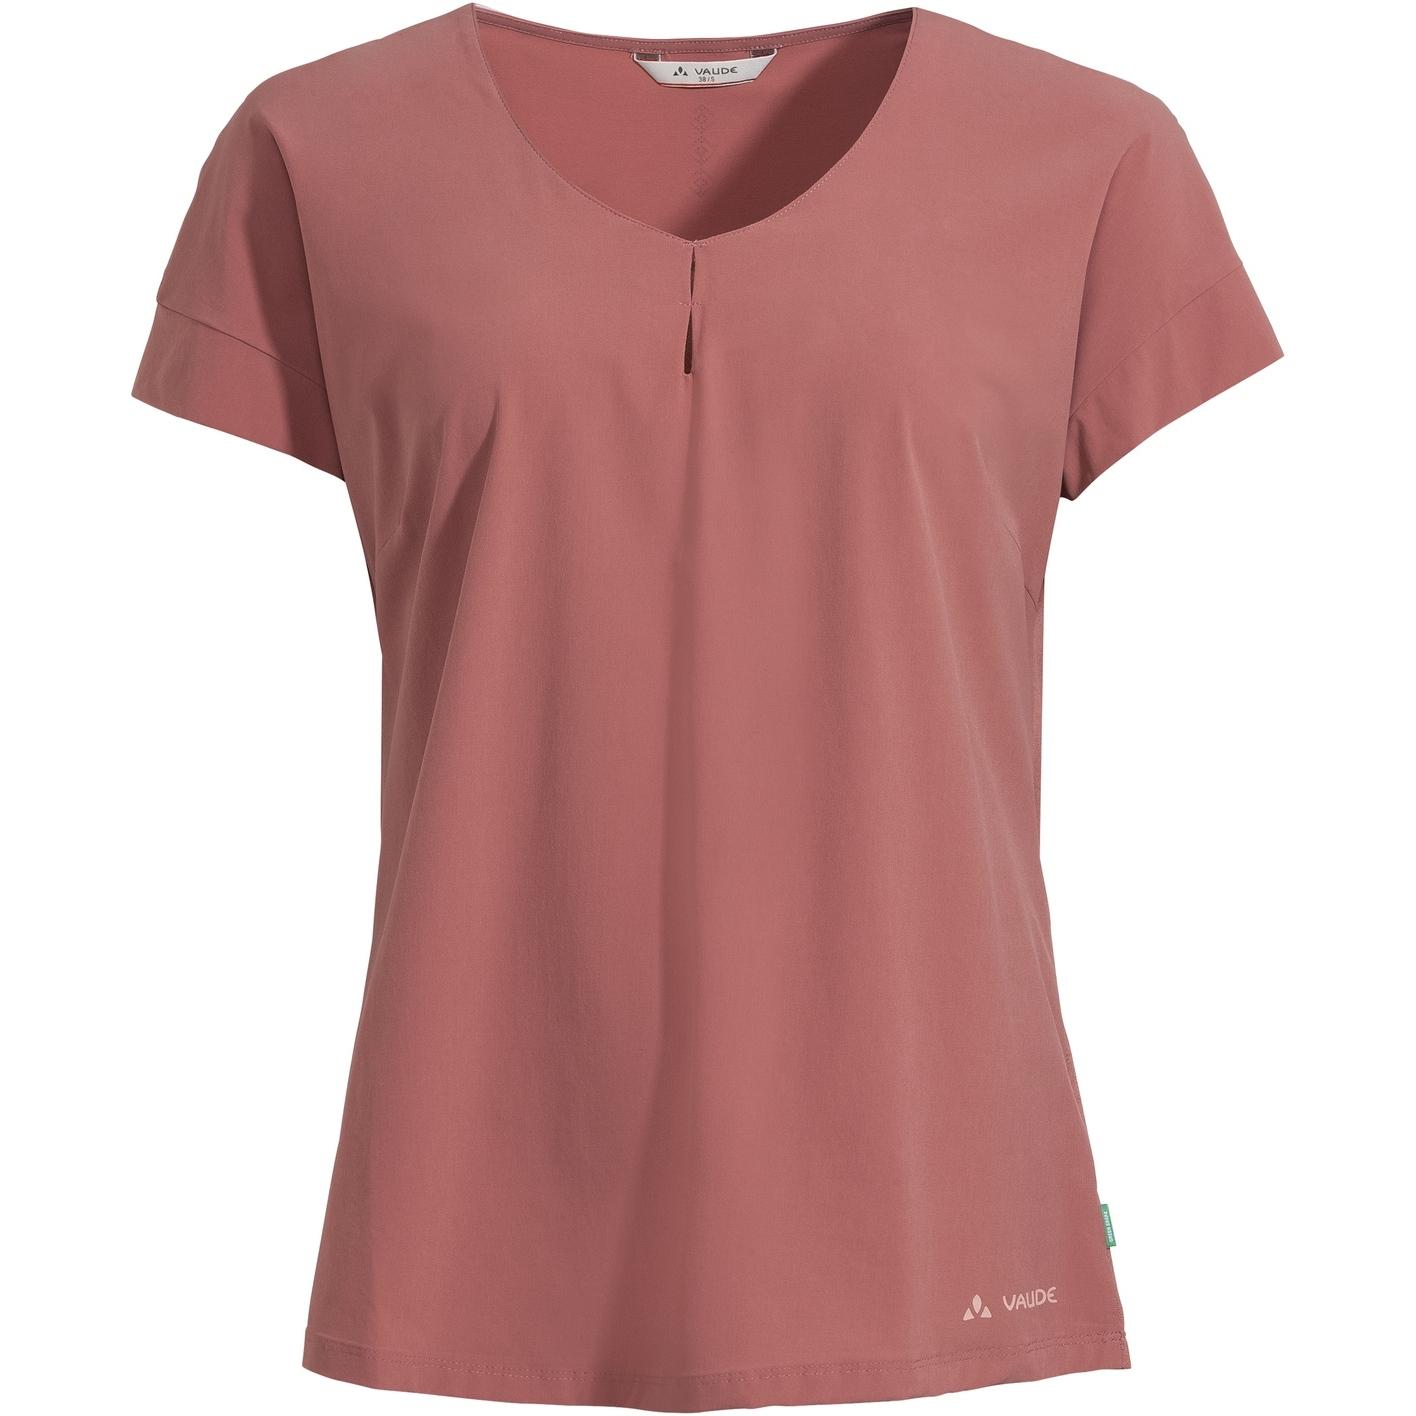 Vaude Skomer V-Neck Damen T-Shirt - dusty rose